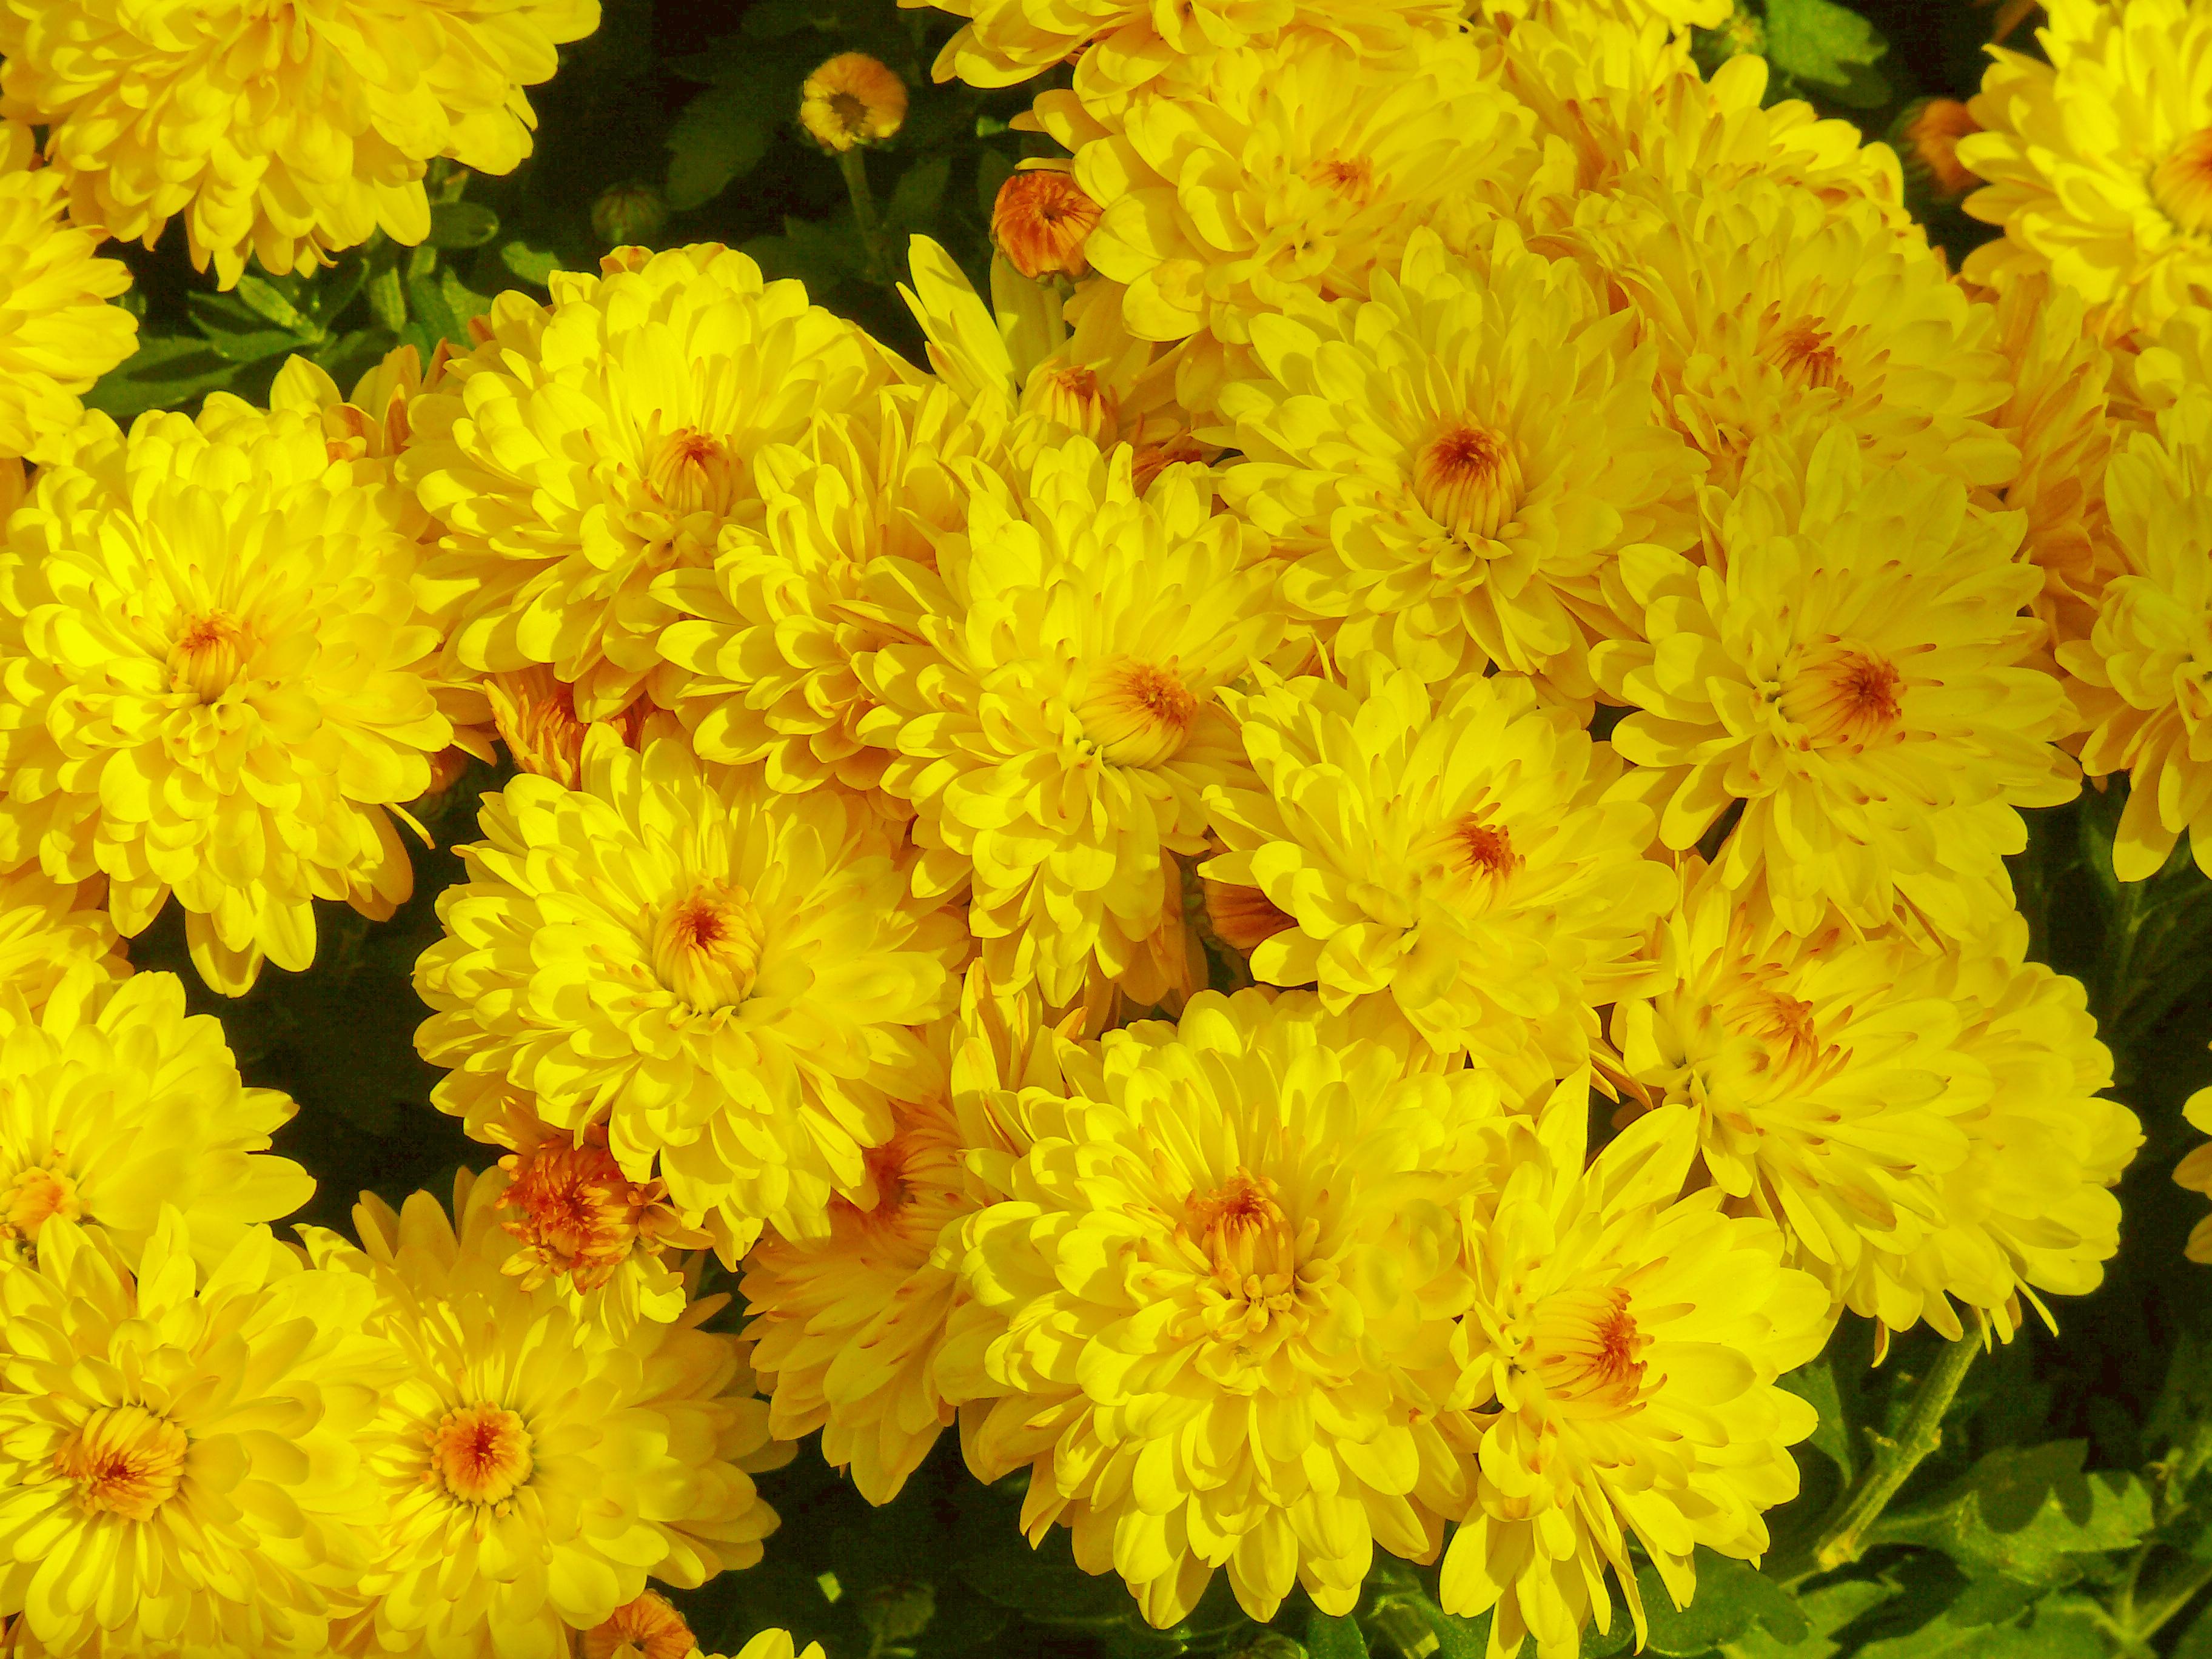 File:Yellow-Flowers.jpg - Wikimedia Commons